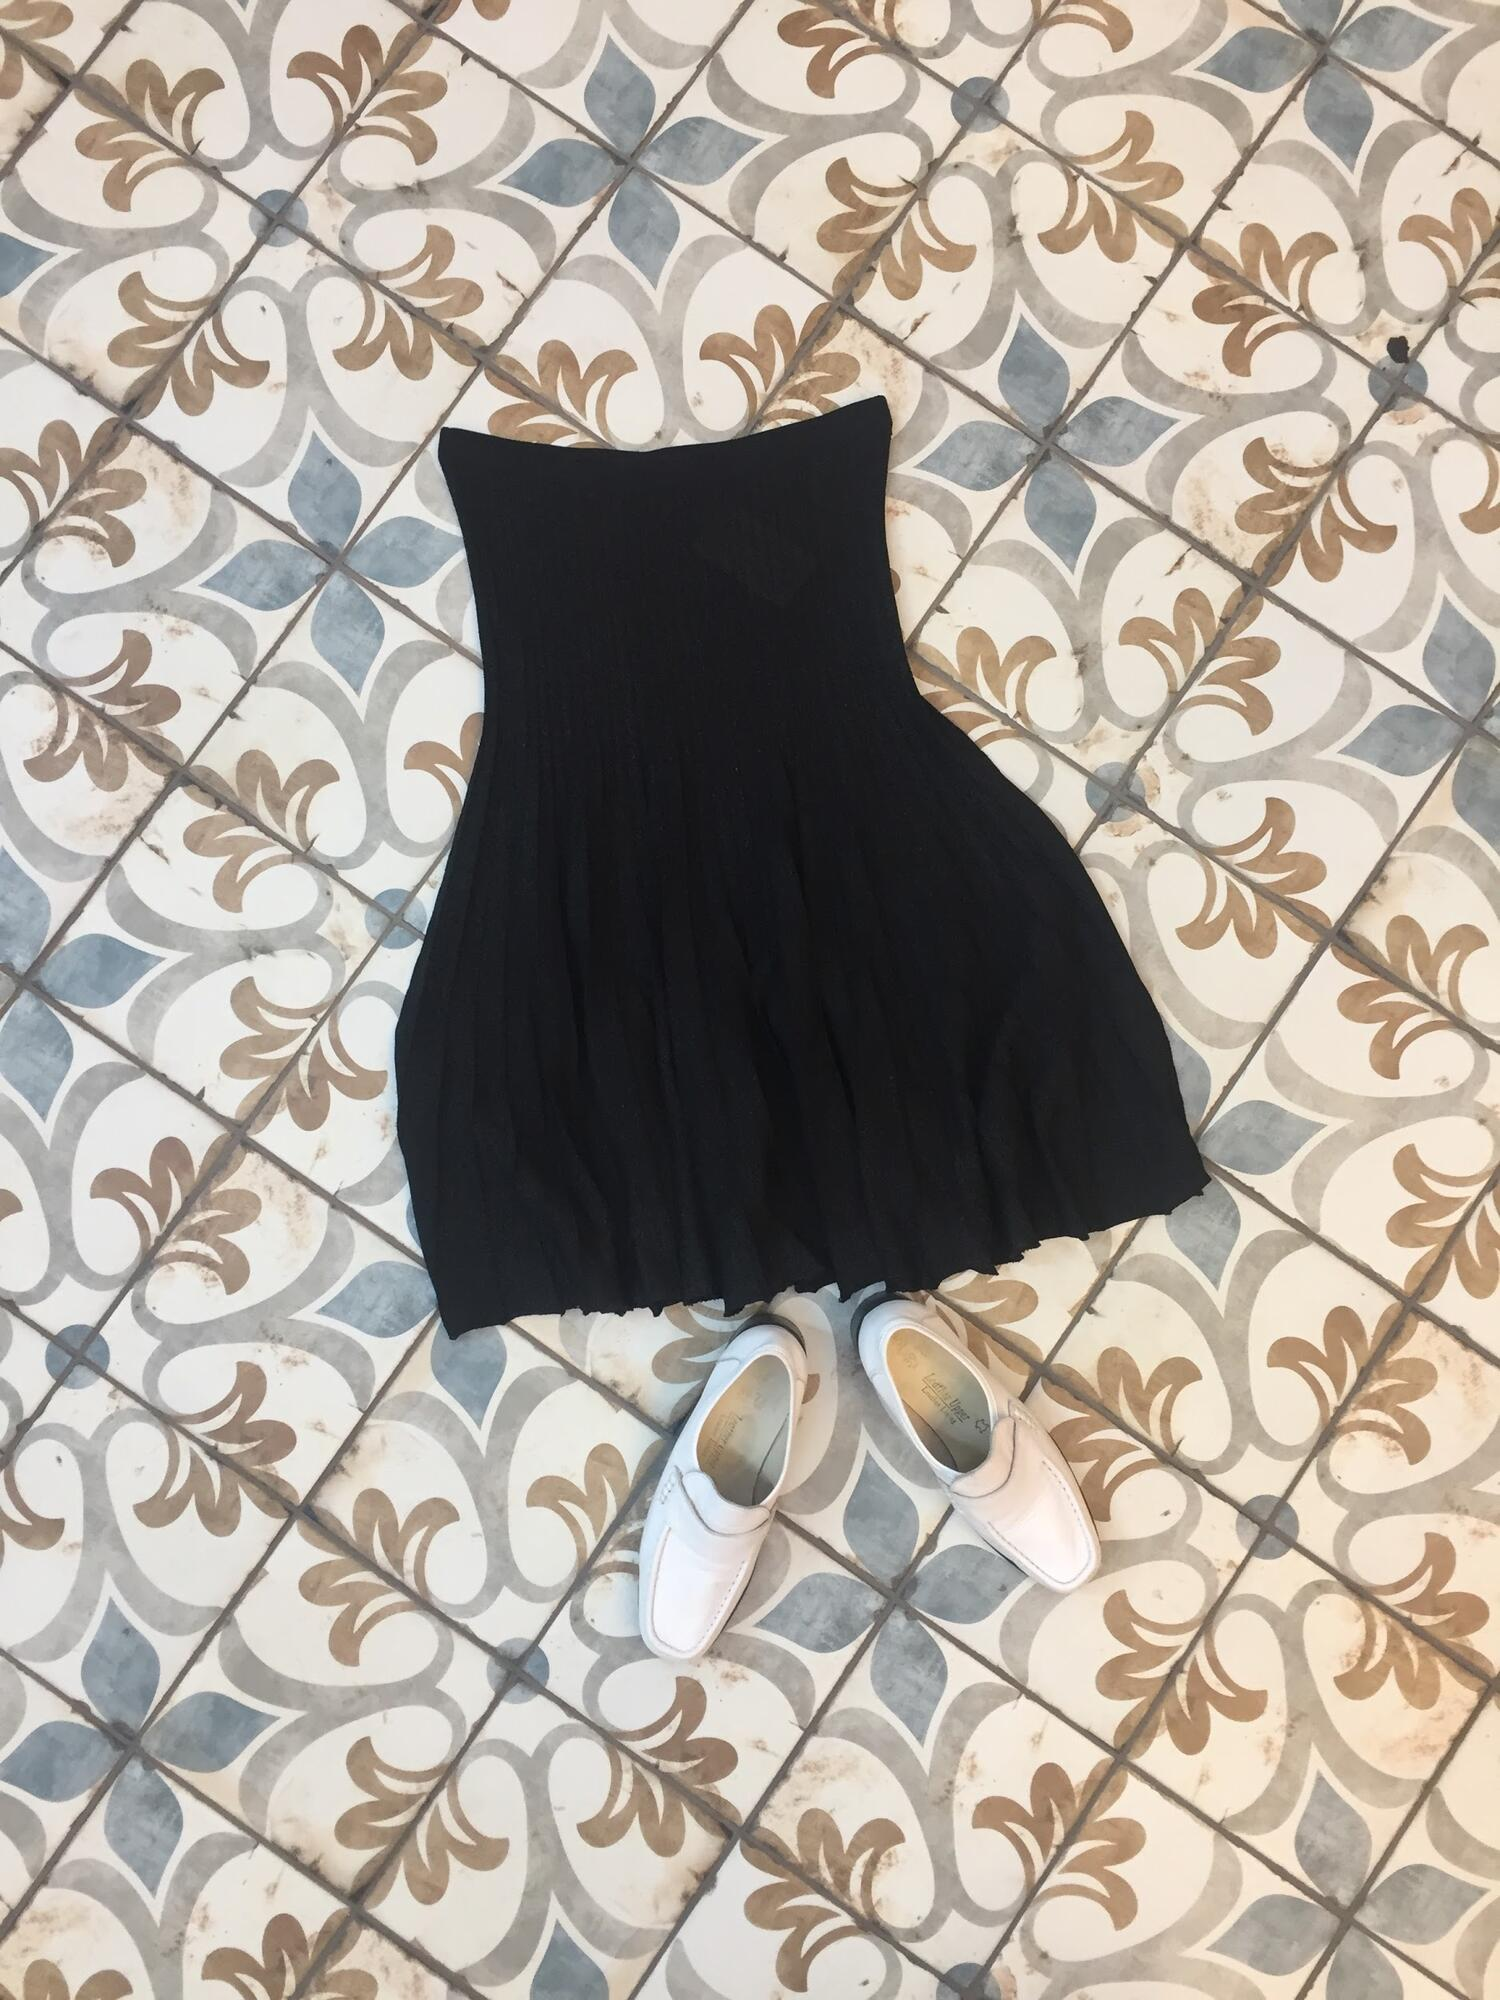 Czarna plisowana spódnica - Vintage Store | JestemSlow.pl